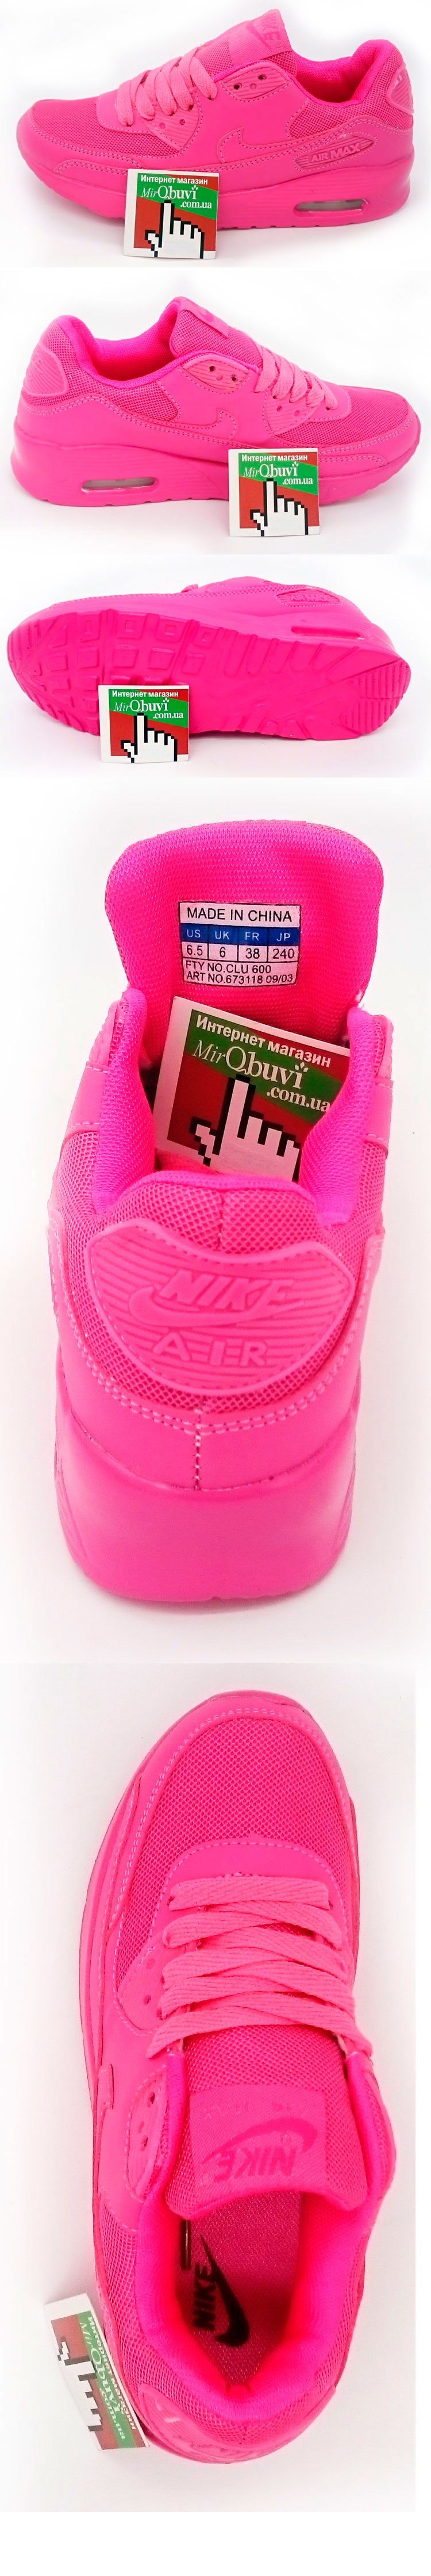 большое фото №5 Nike Air Max 90 vinous